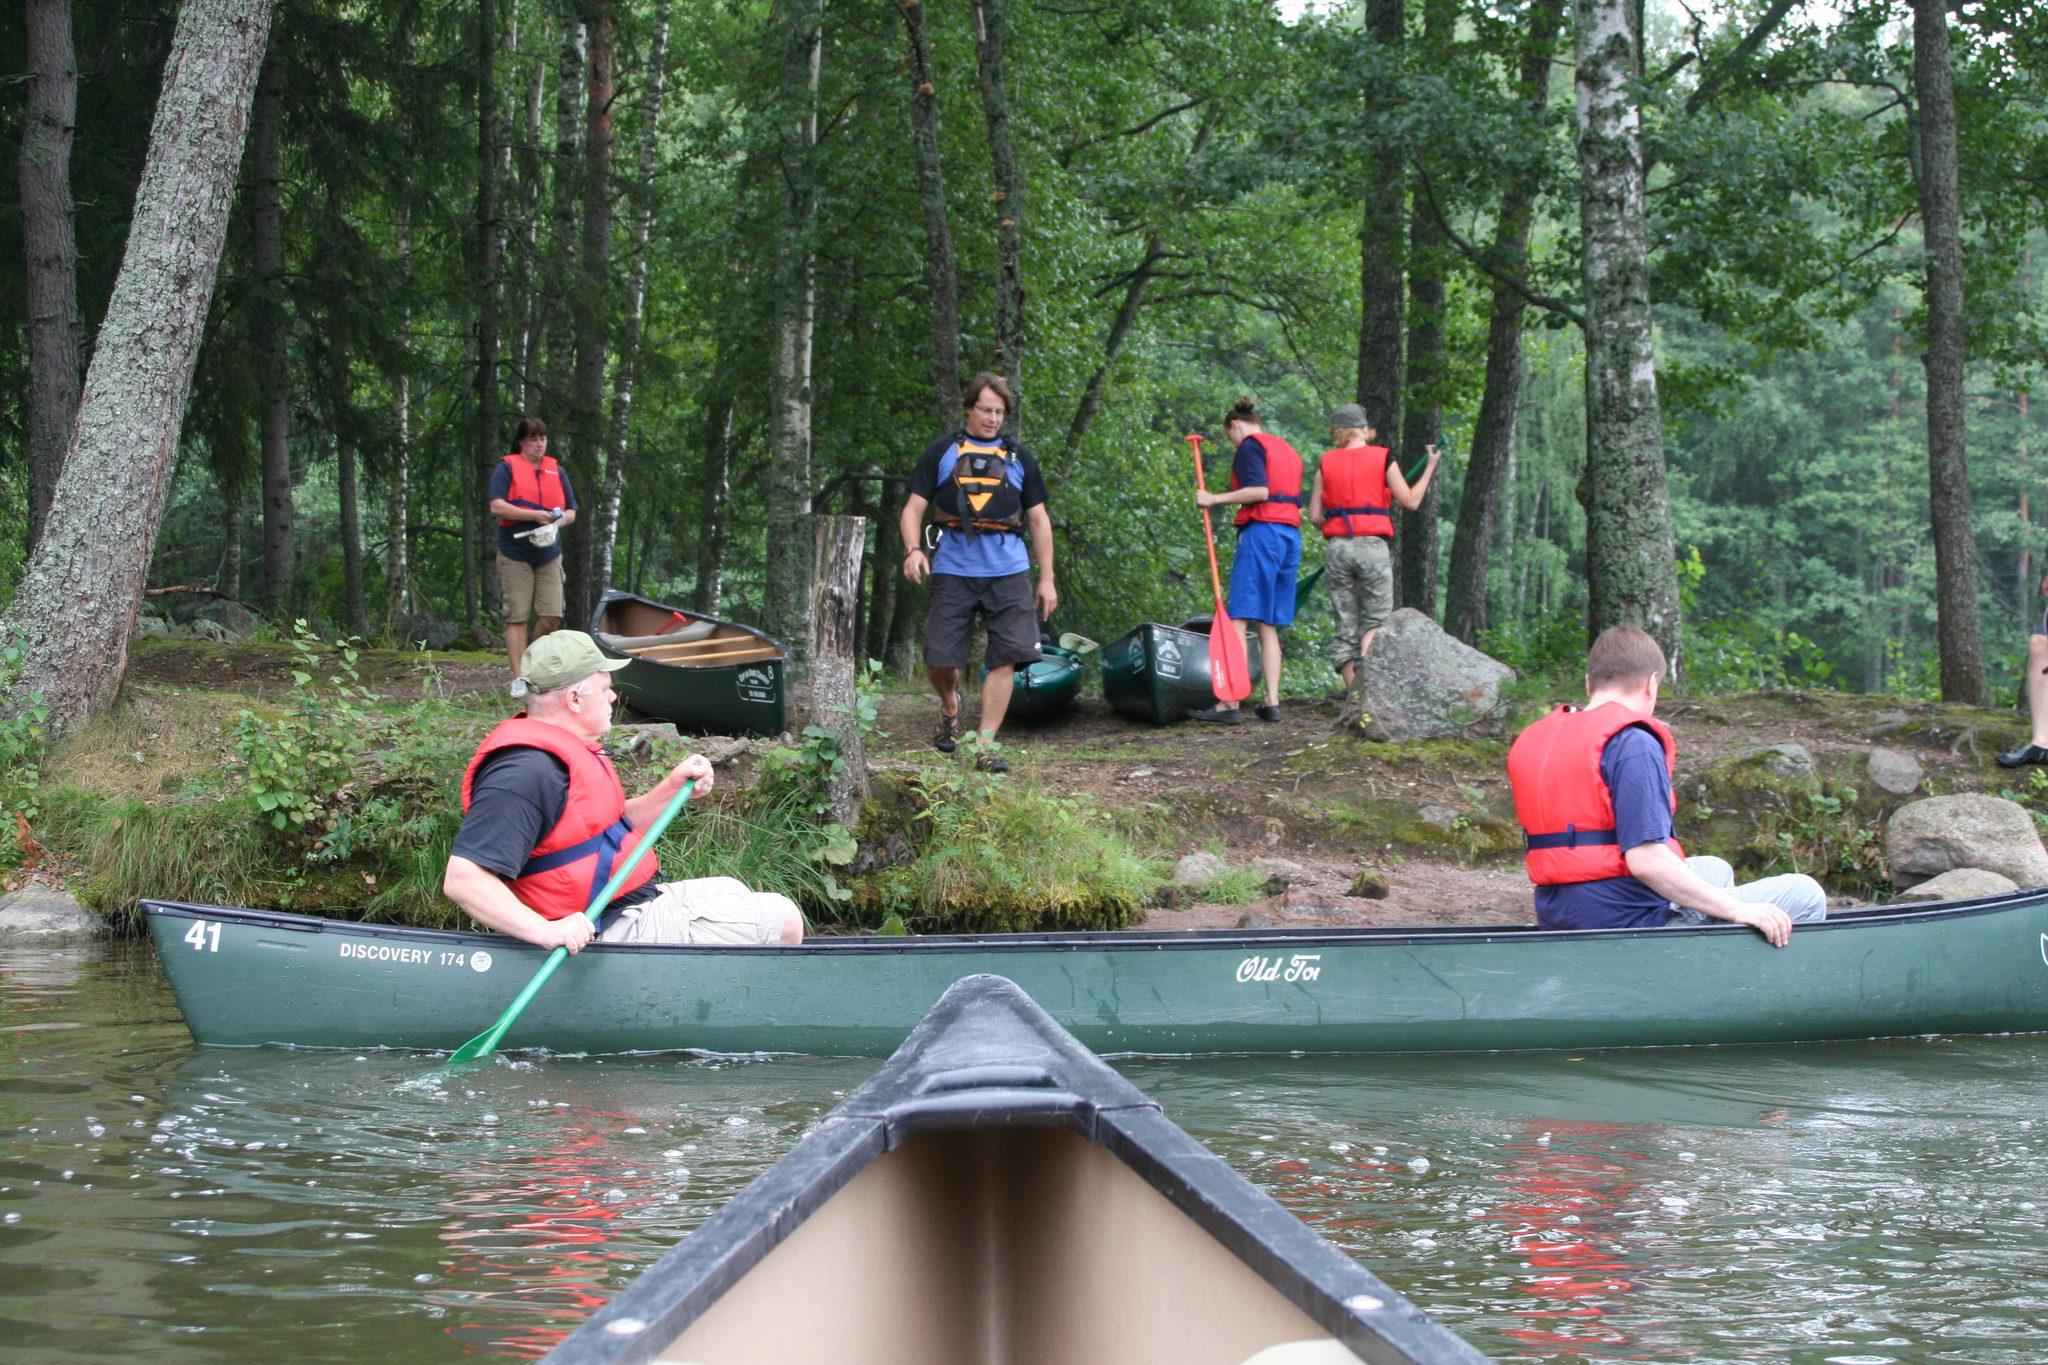 Melontaretket - Canoeing Trips